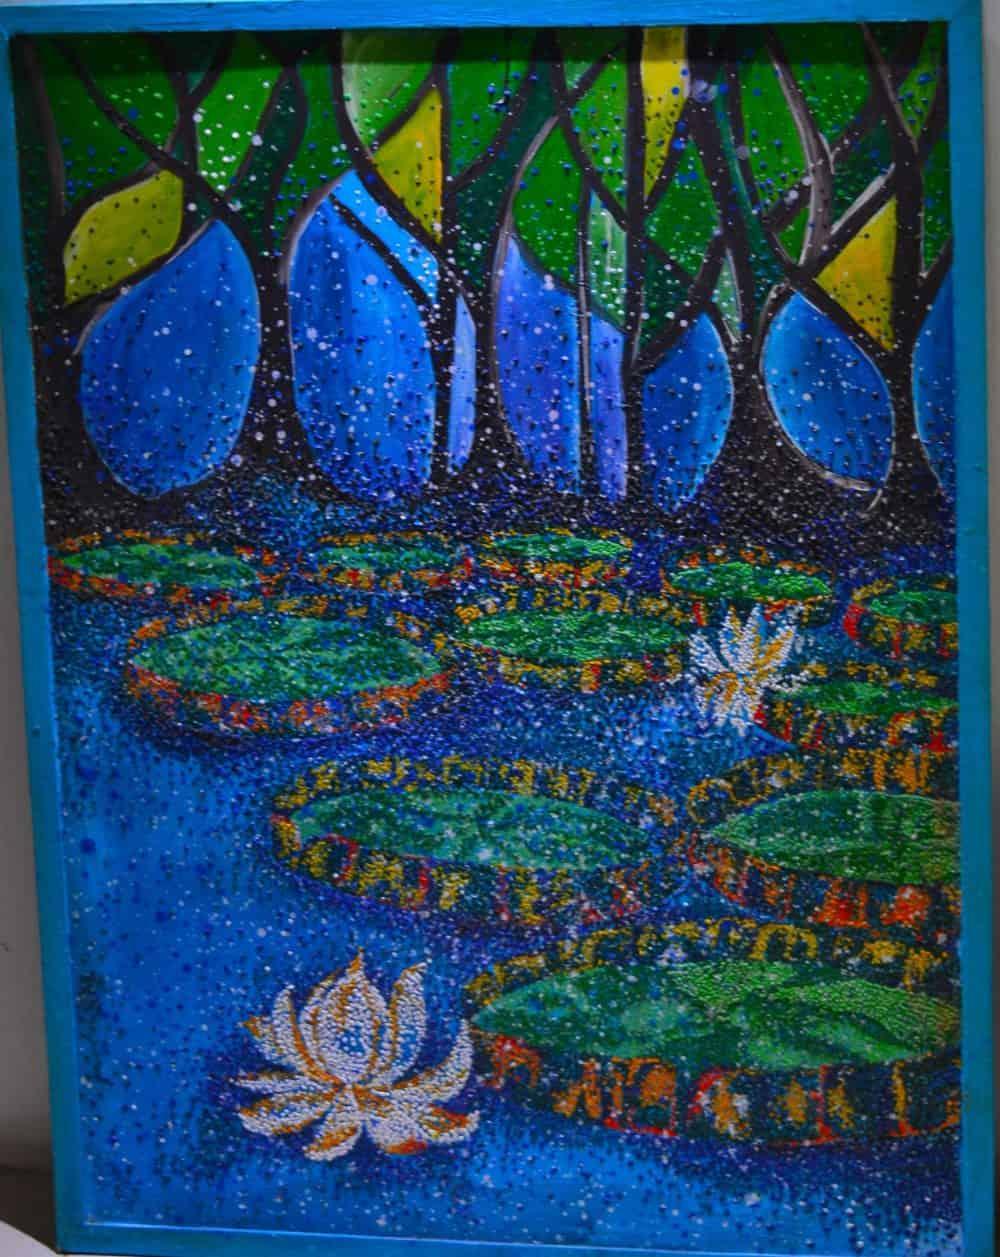 Mauritius Arts & Artists - mauritius-arts-jessie-gooriah-6